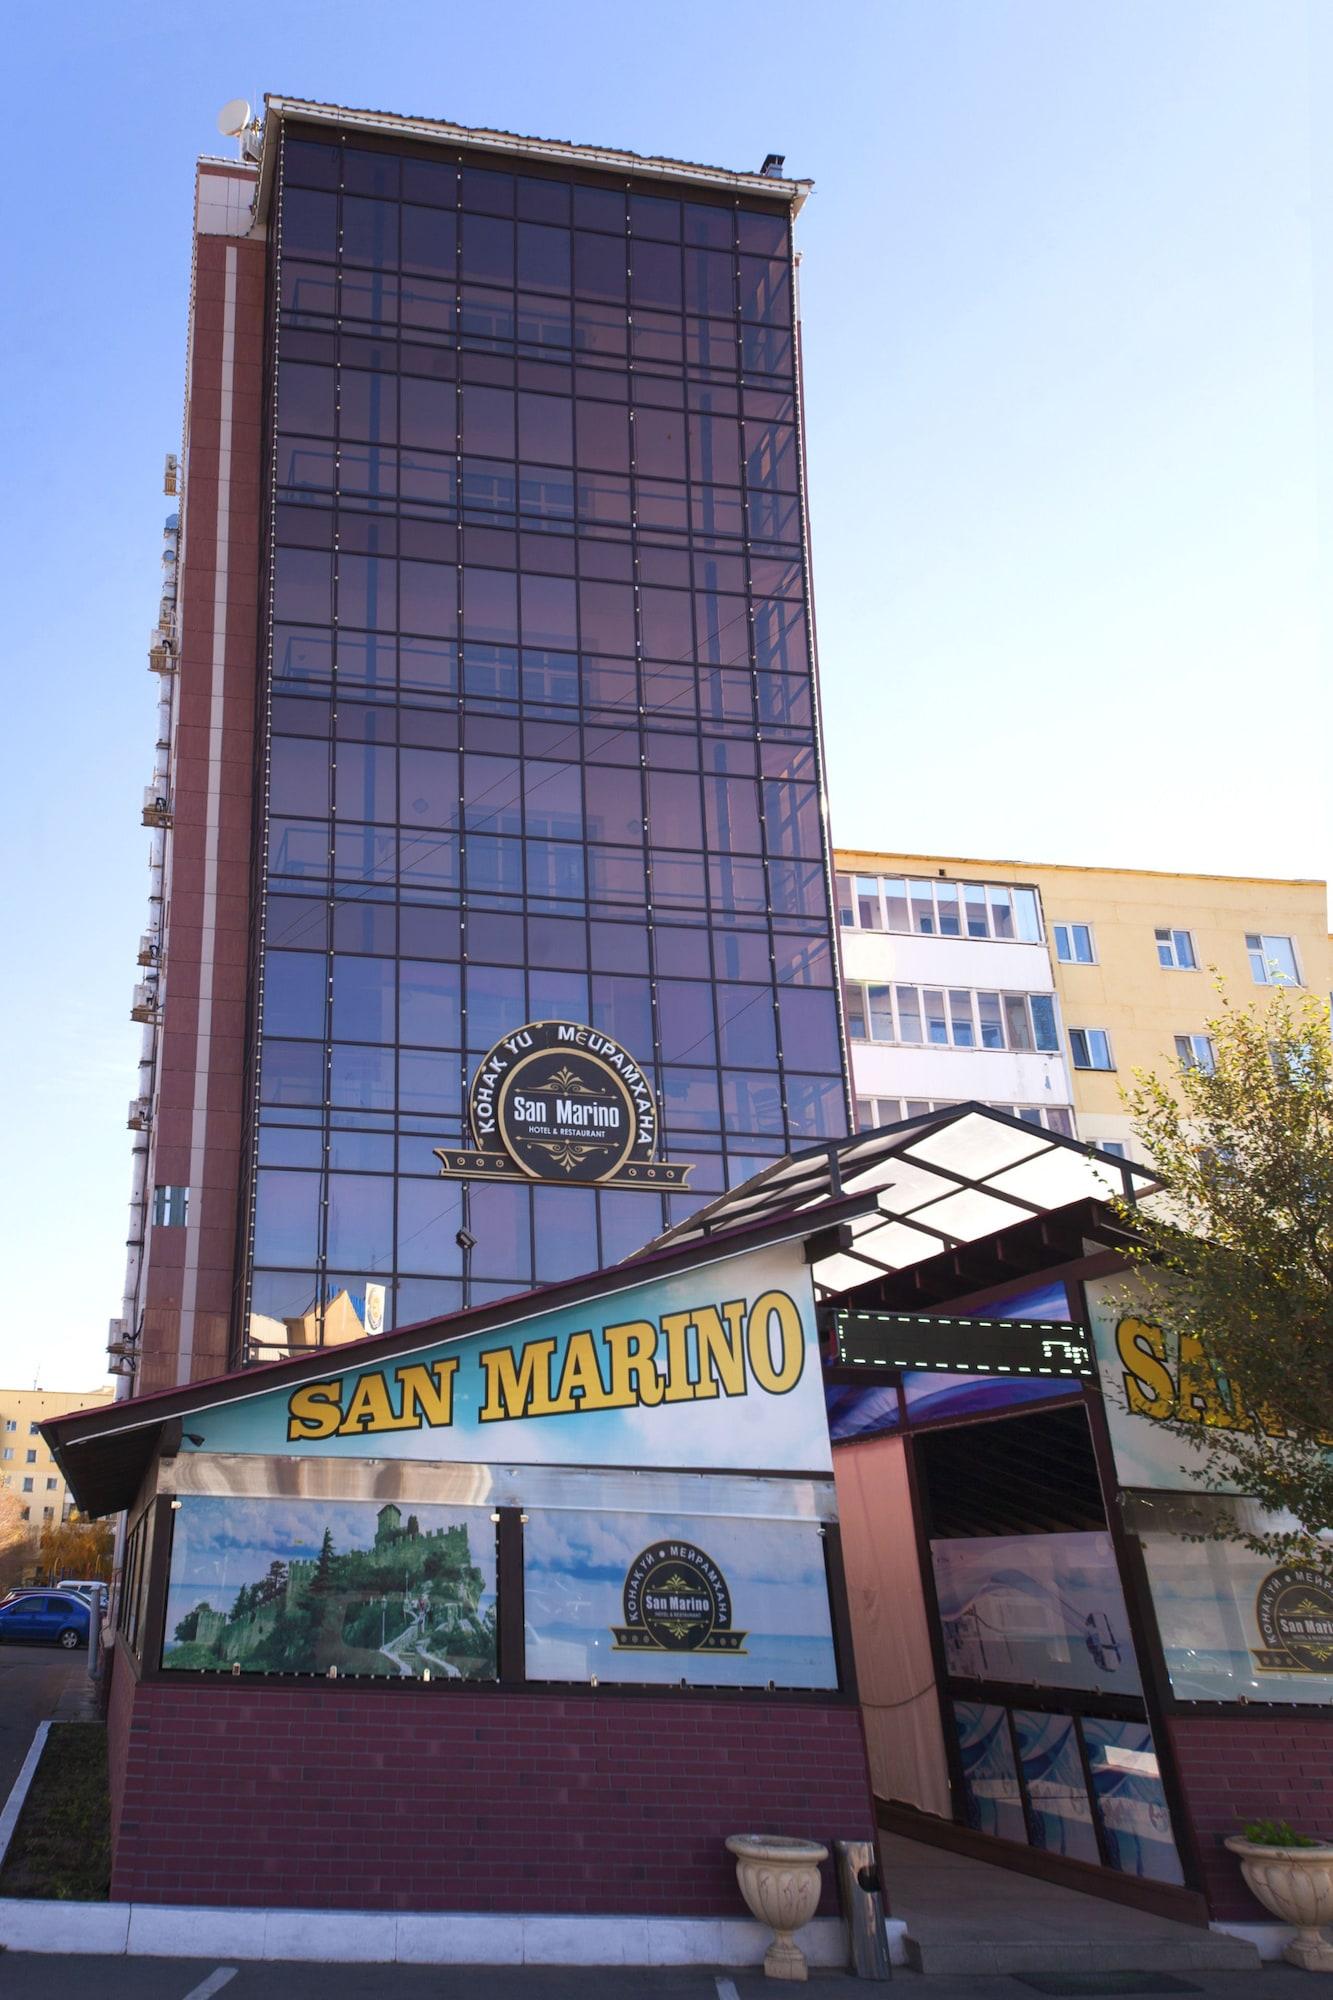 Hotel San Marino, Tselinogradskiy